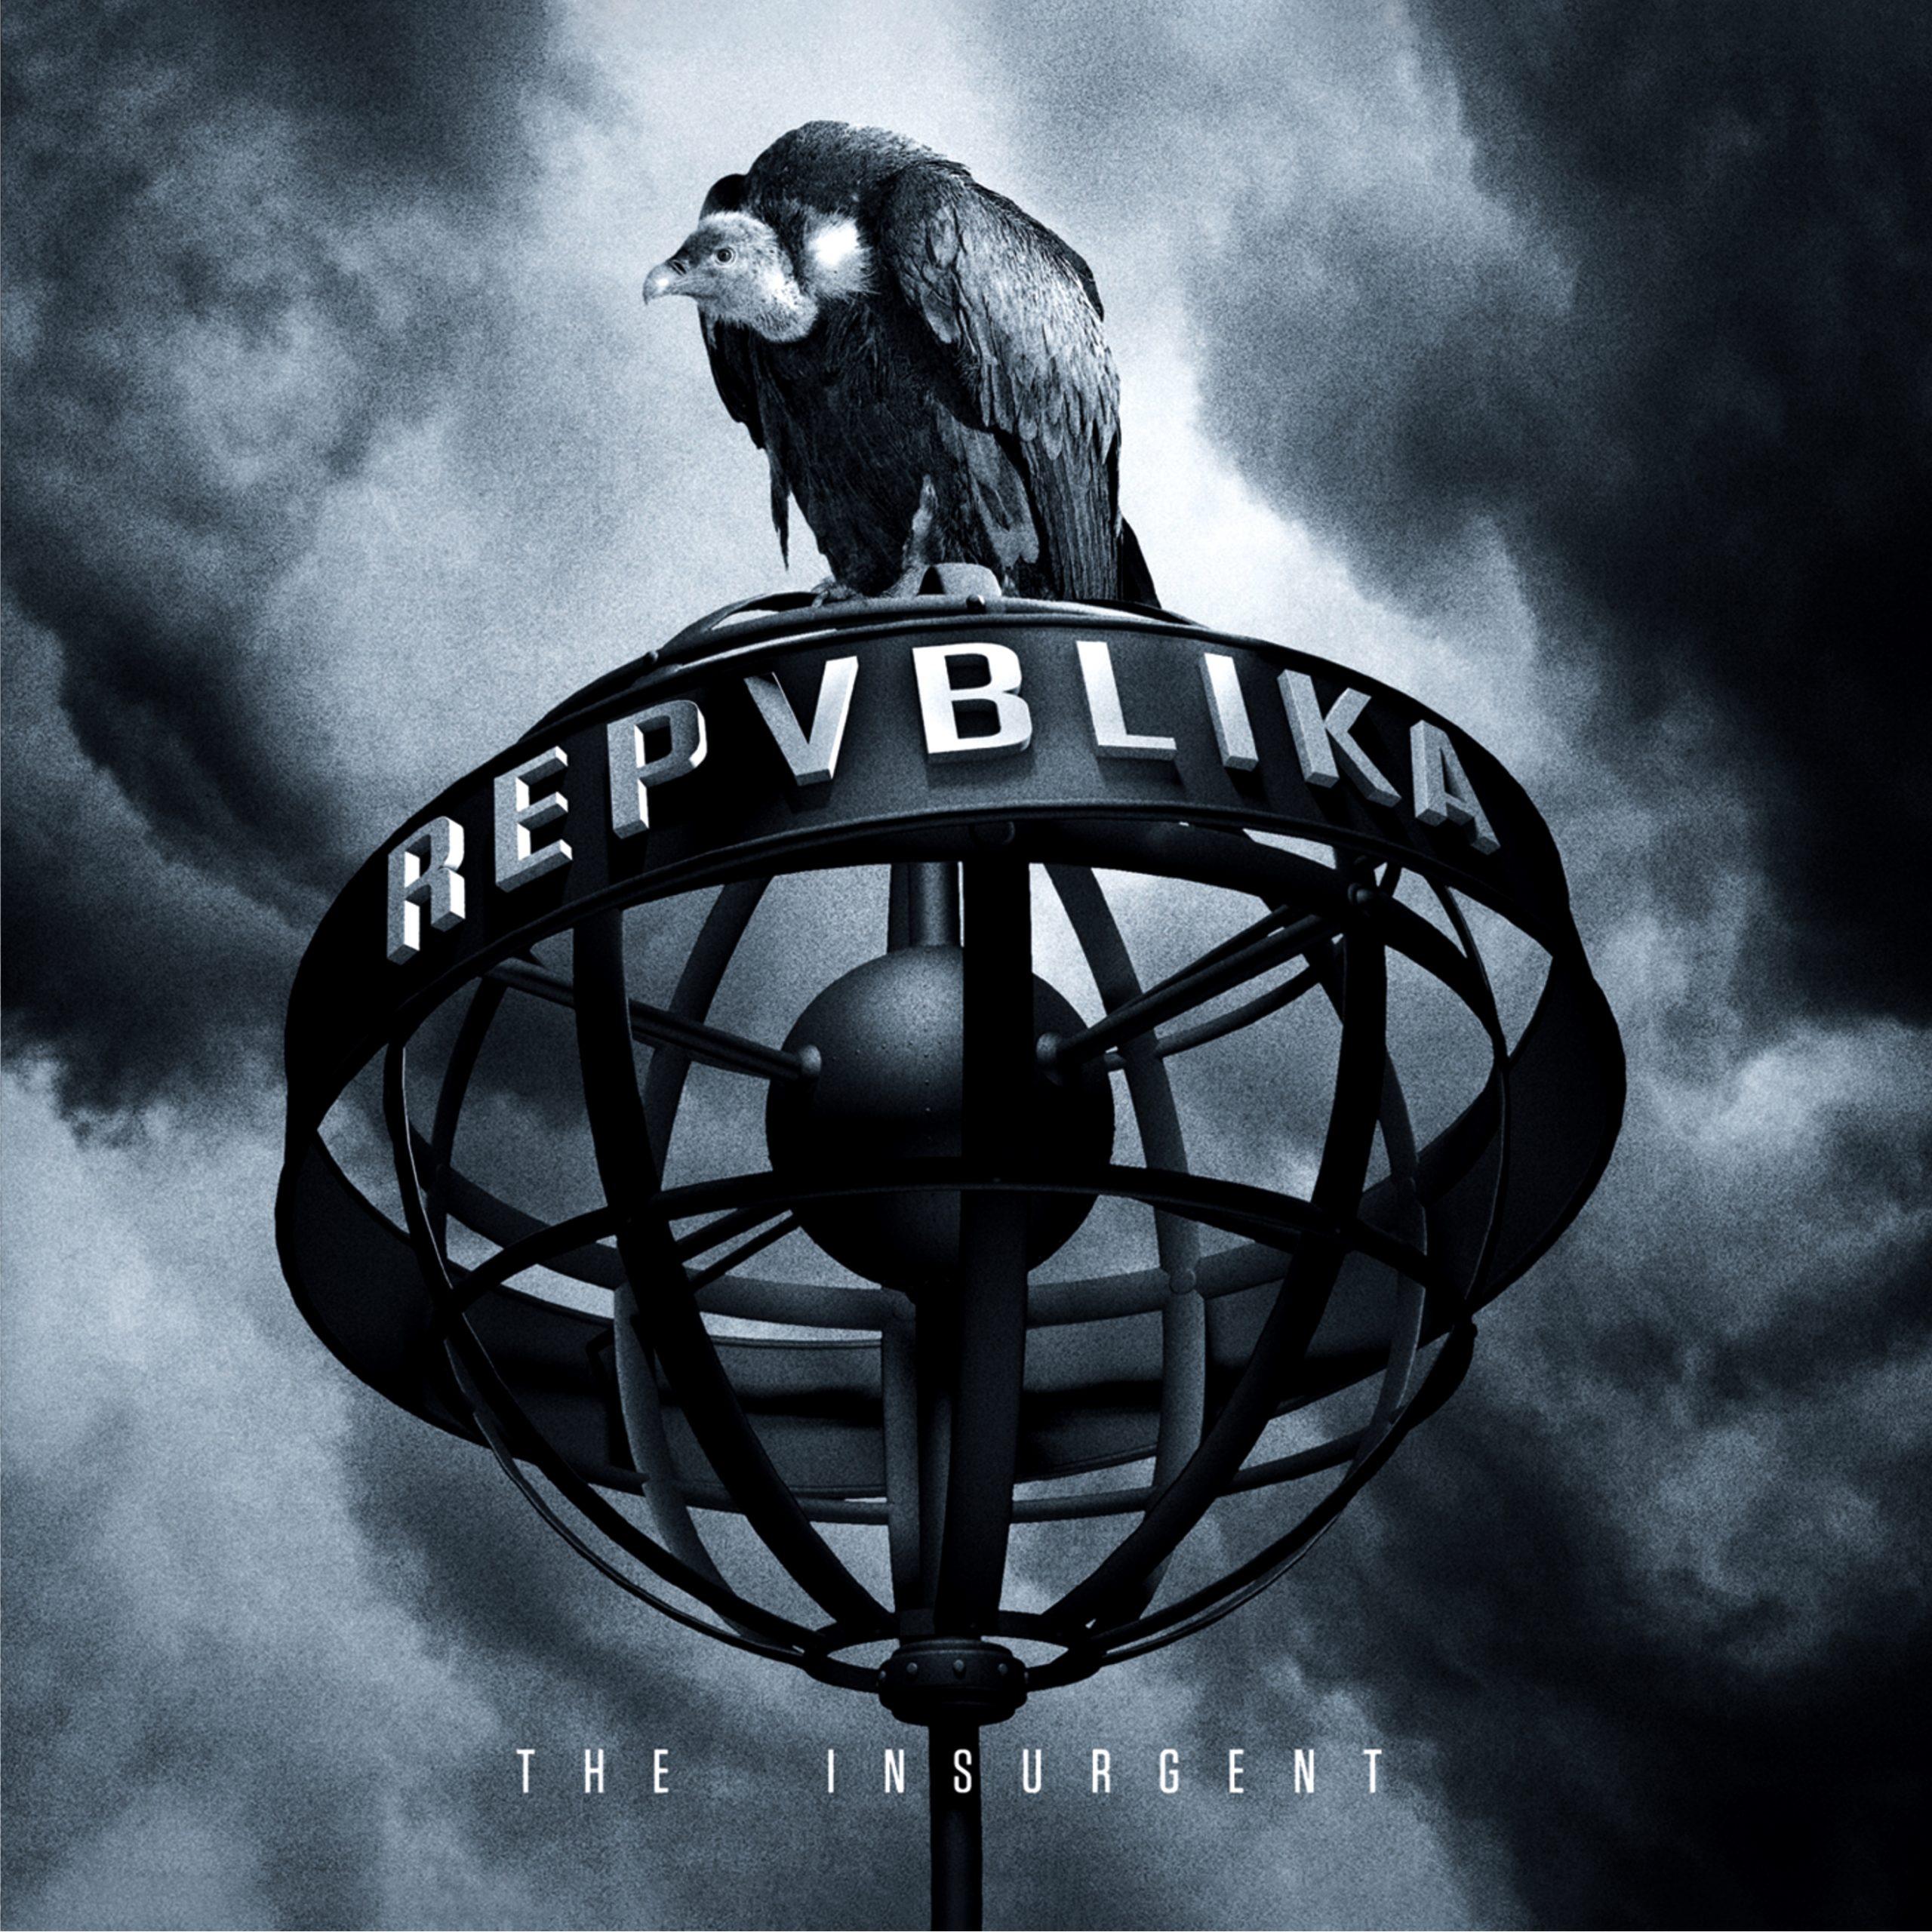 Repvblika - The Insurgent